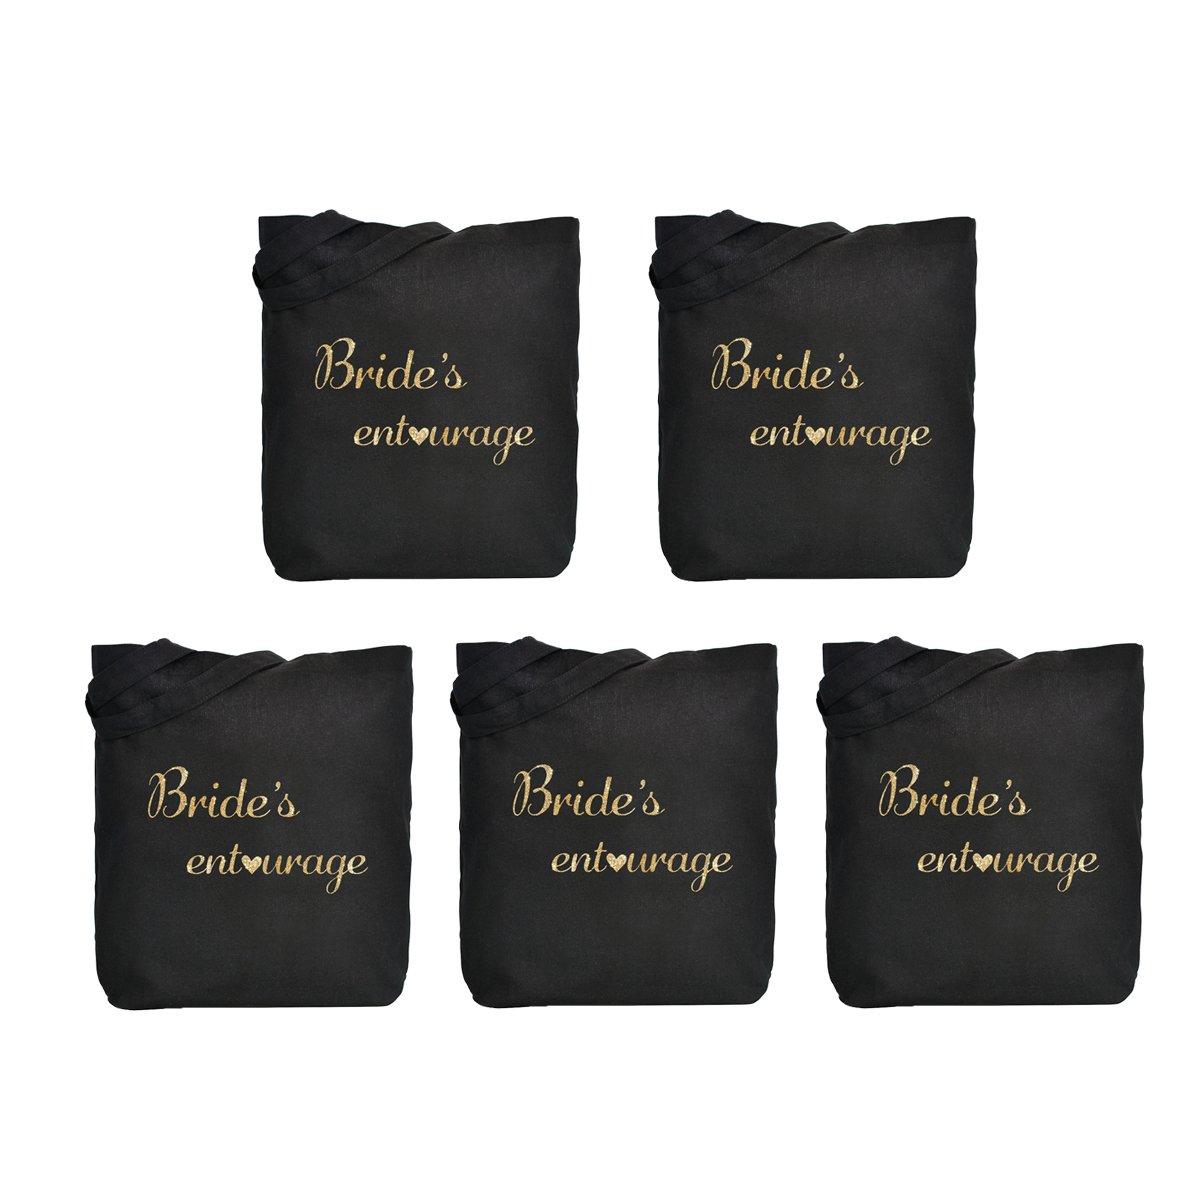 ElegantPark Bride's Entourage Tote Bag Wedding Gifts Black Cotton Gold Script 5 Pcs